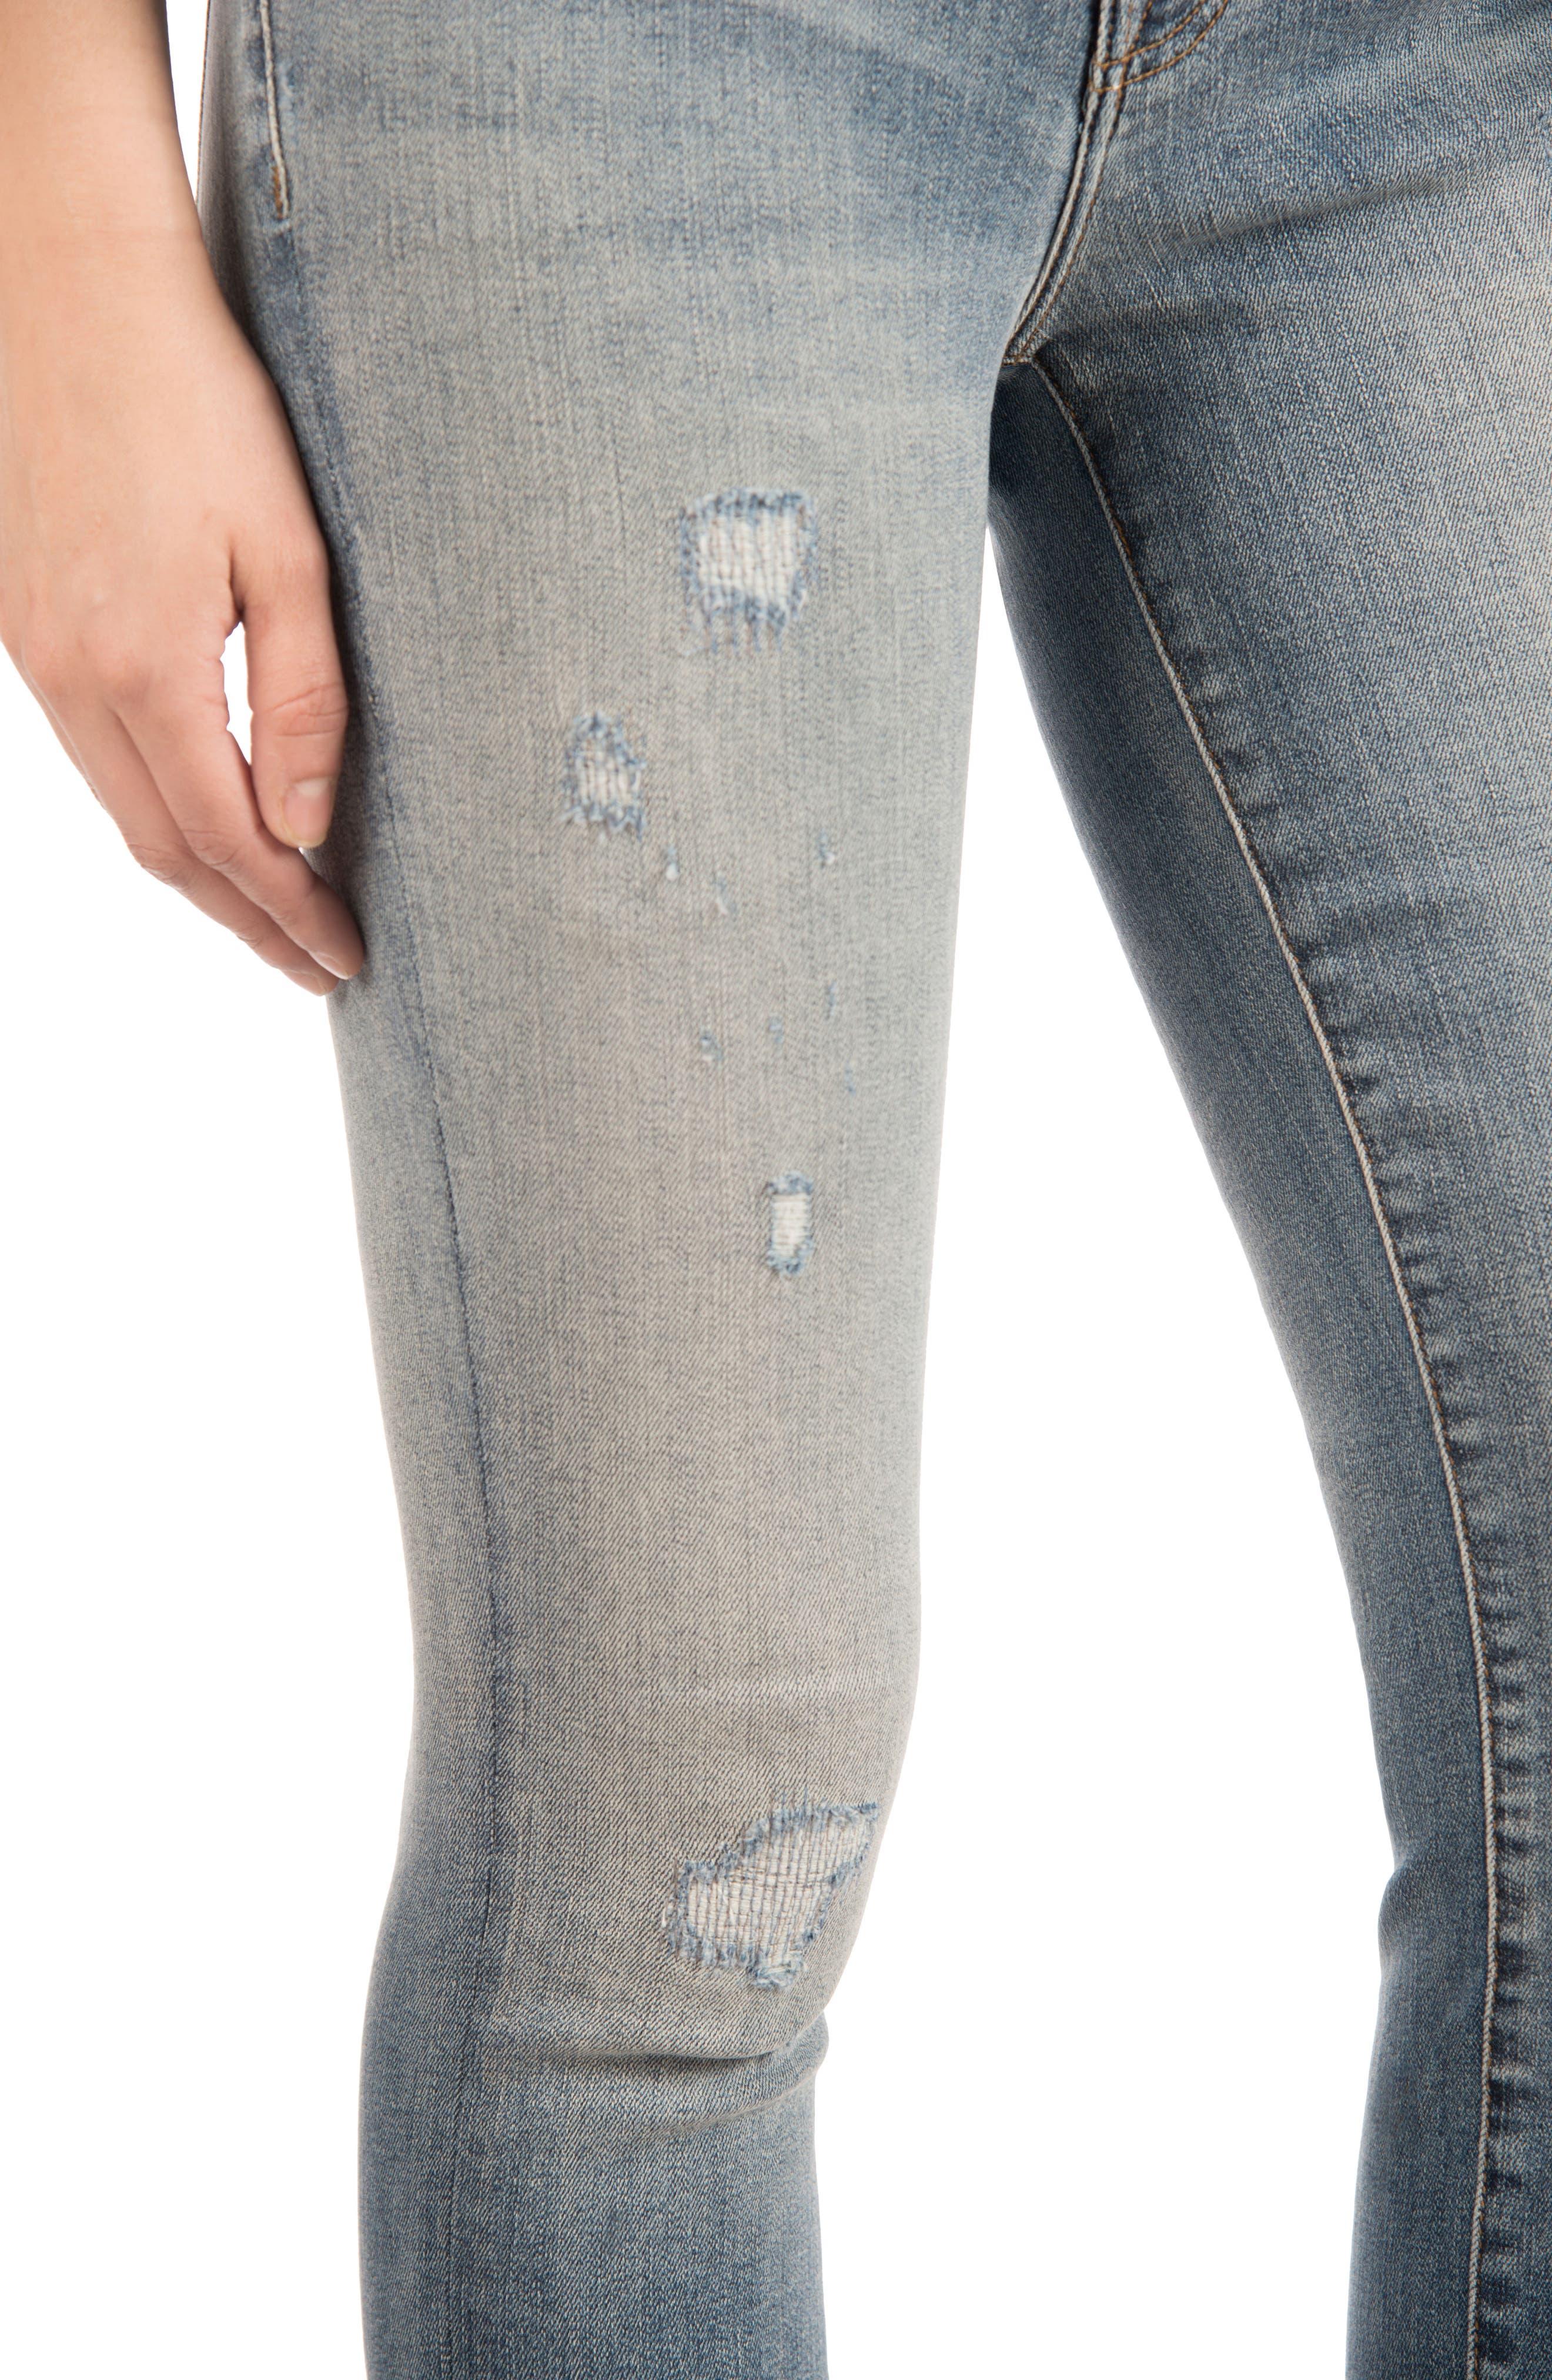 835 Distressed Capri Skinny Jeans,                             Alternate thumbnail 4, color,                             430